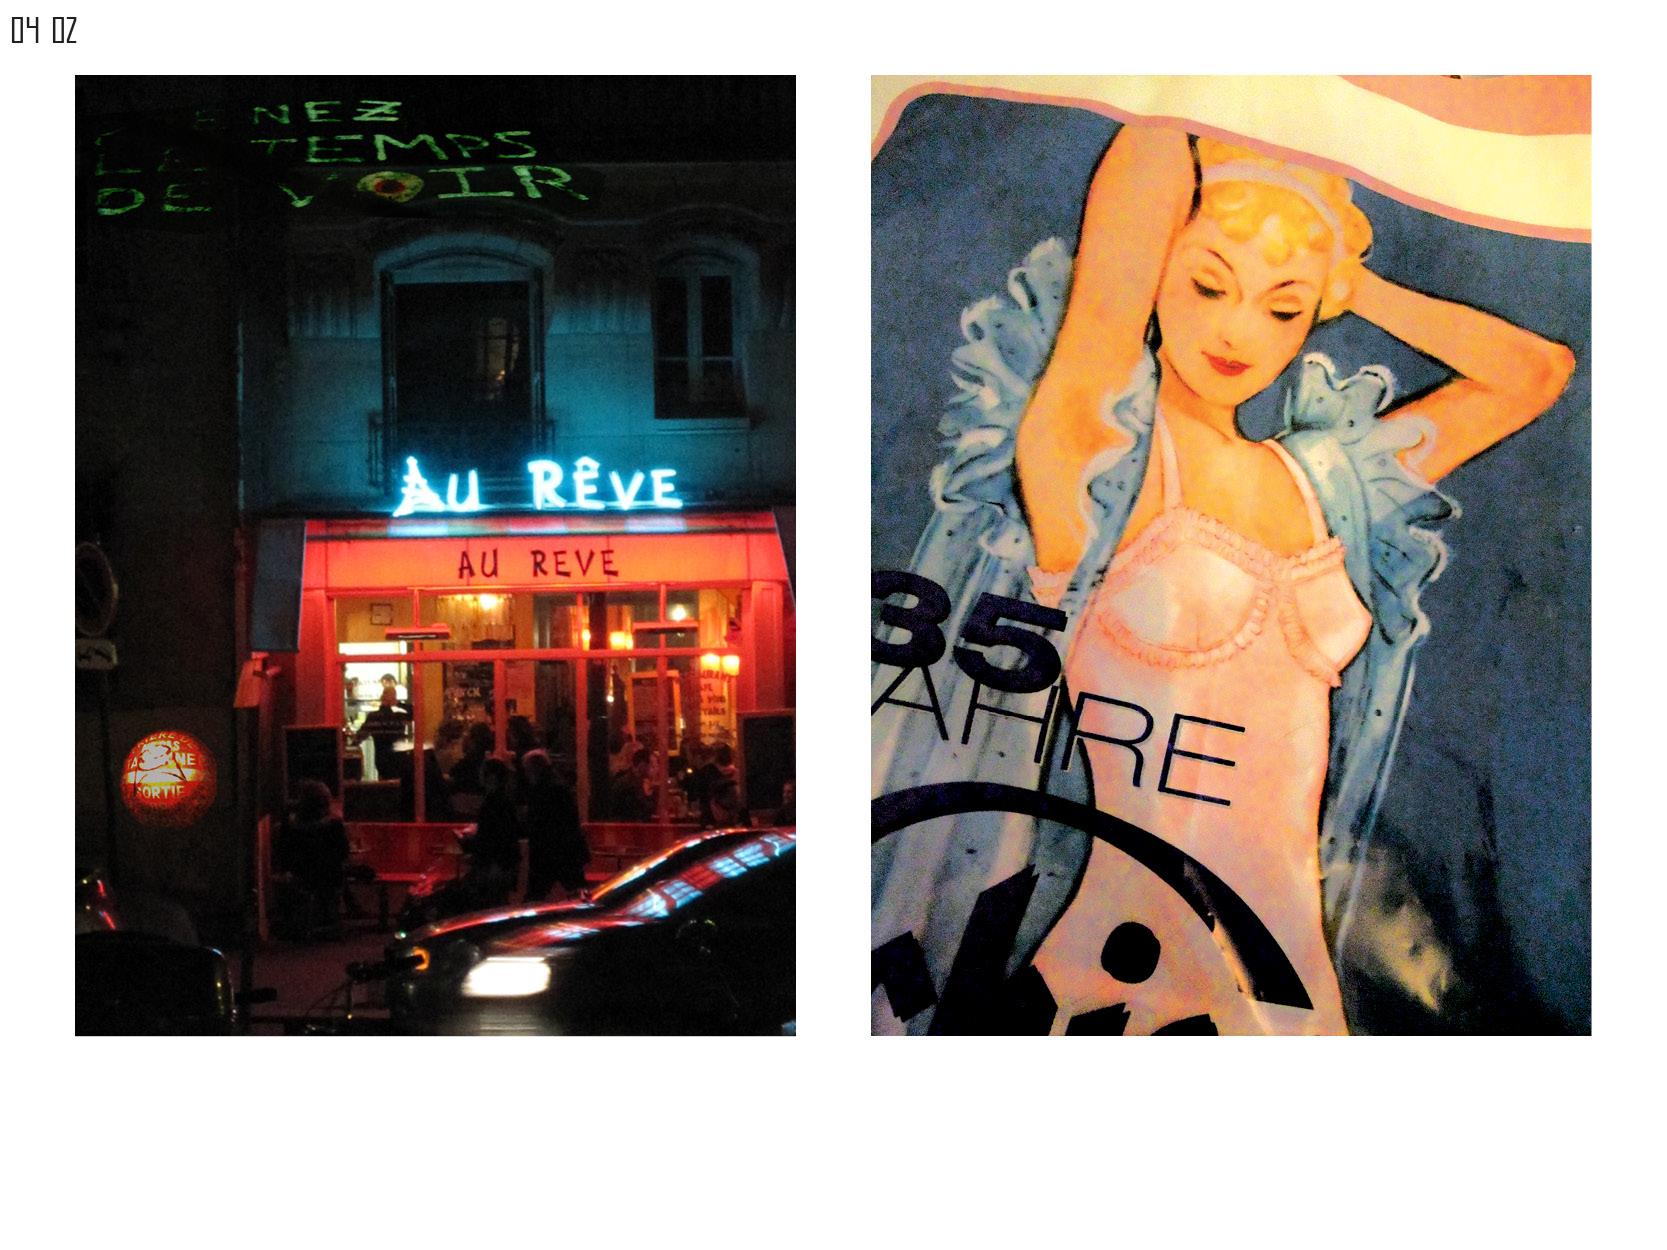 Gerrit-Schweiger-Dialog-Städte-Paris-Berlin-Jessica-Blank-Experiment-Fotoserie-Tagebuch-visuelle-Kommunikation-95